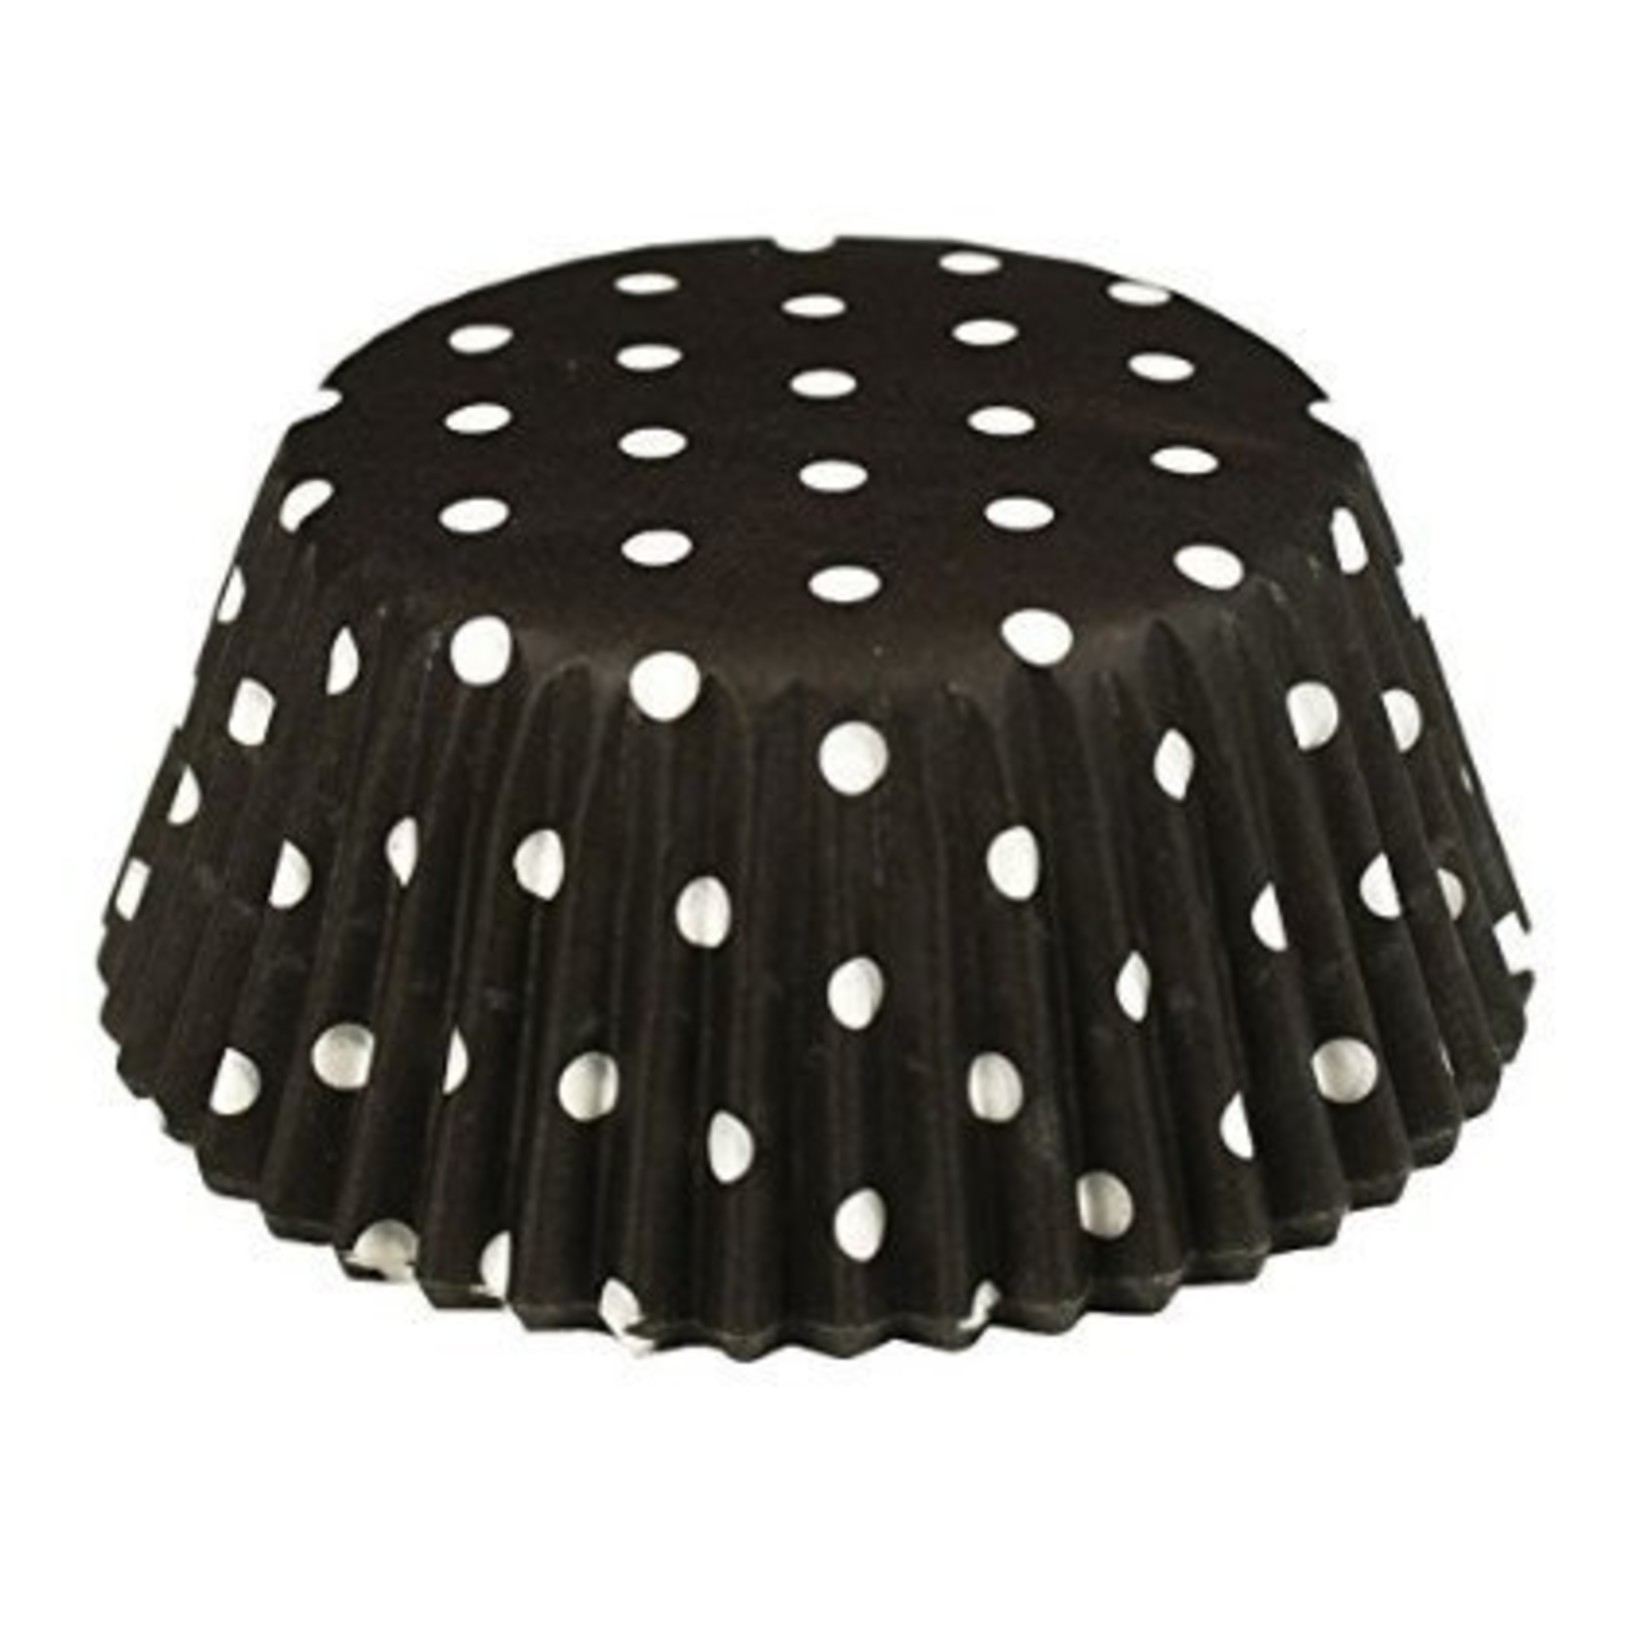 Baking Cups-Black Polka Dots-2''-75pk